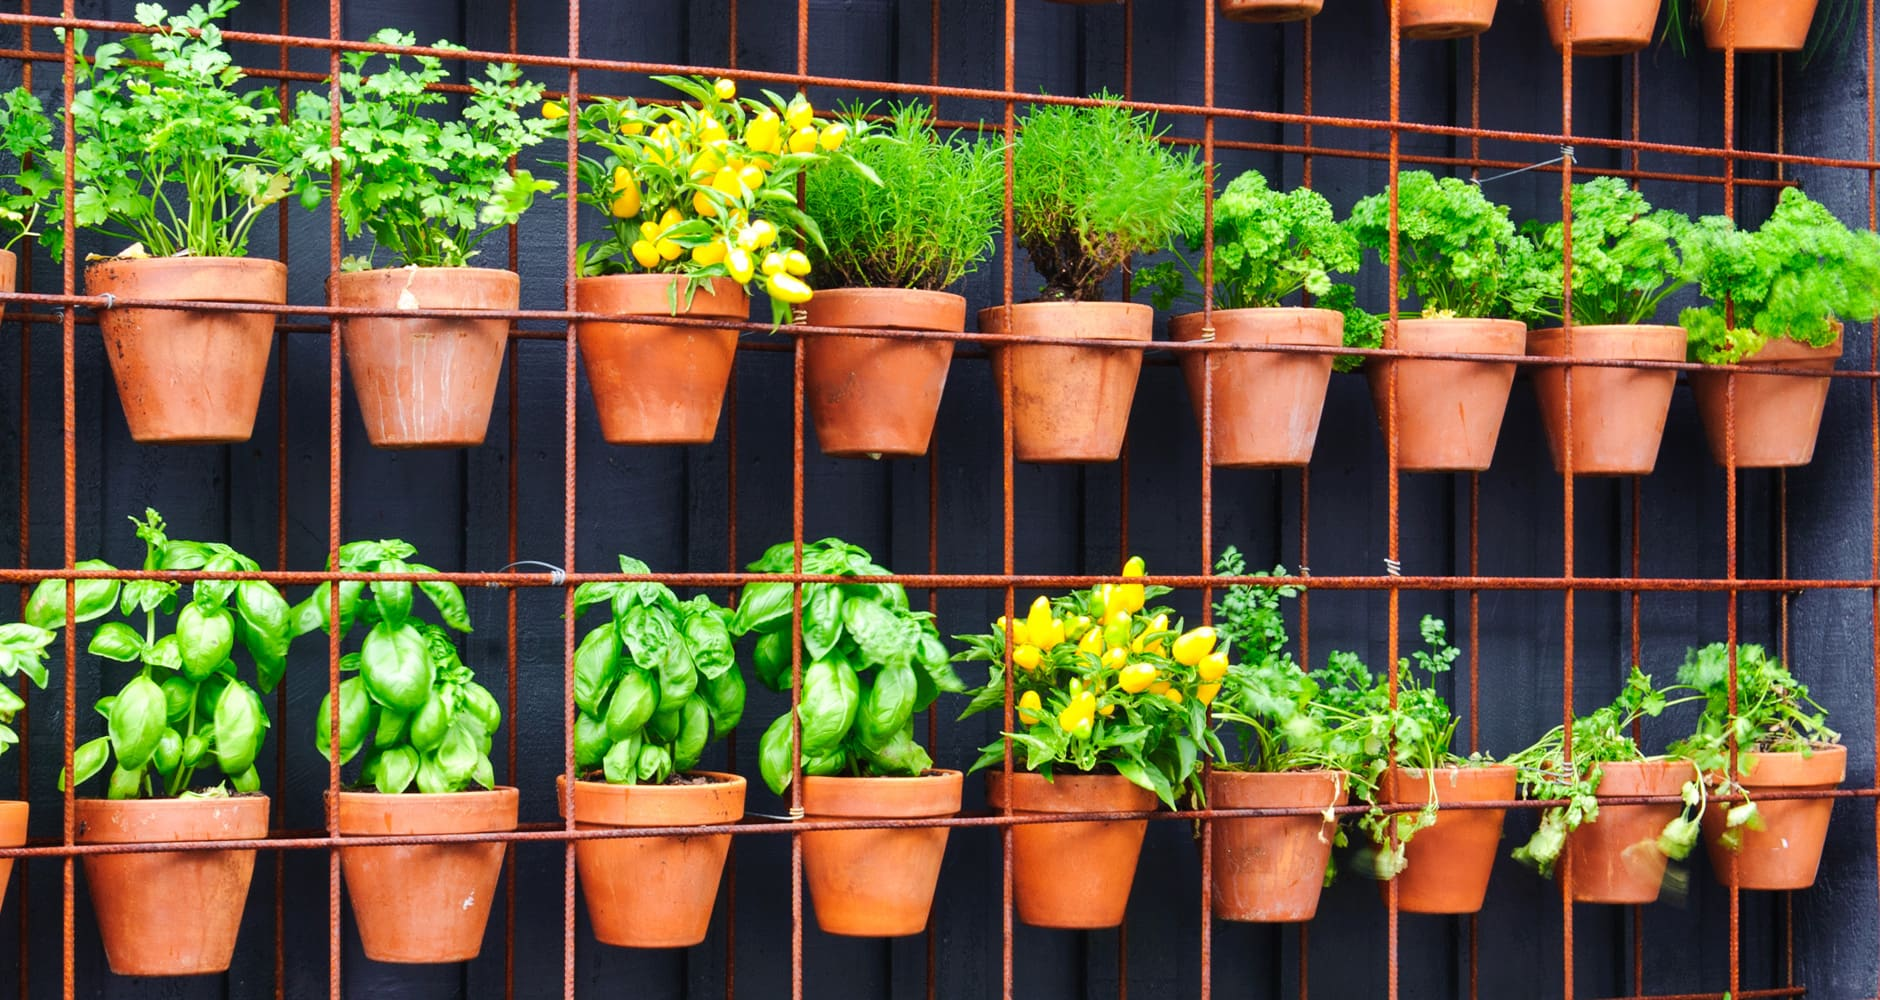 Big Gardening Ideas For Small Spaces   Farmers' Almanac